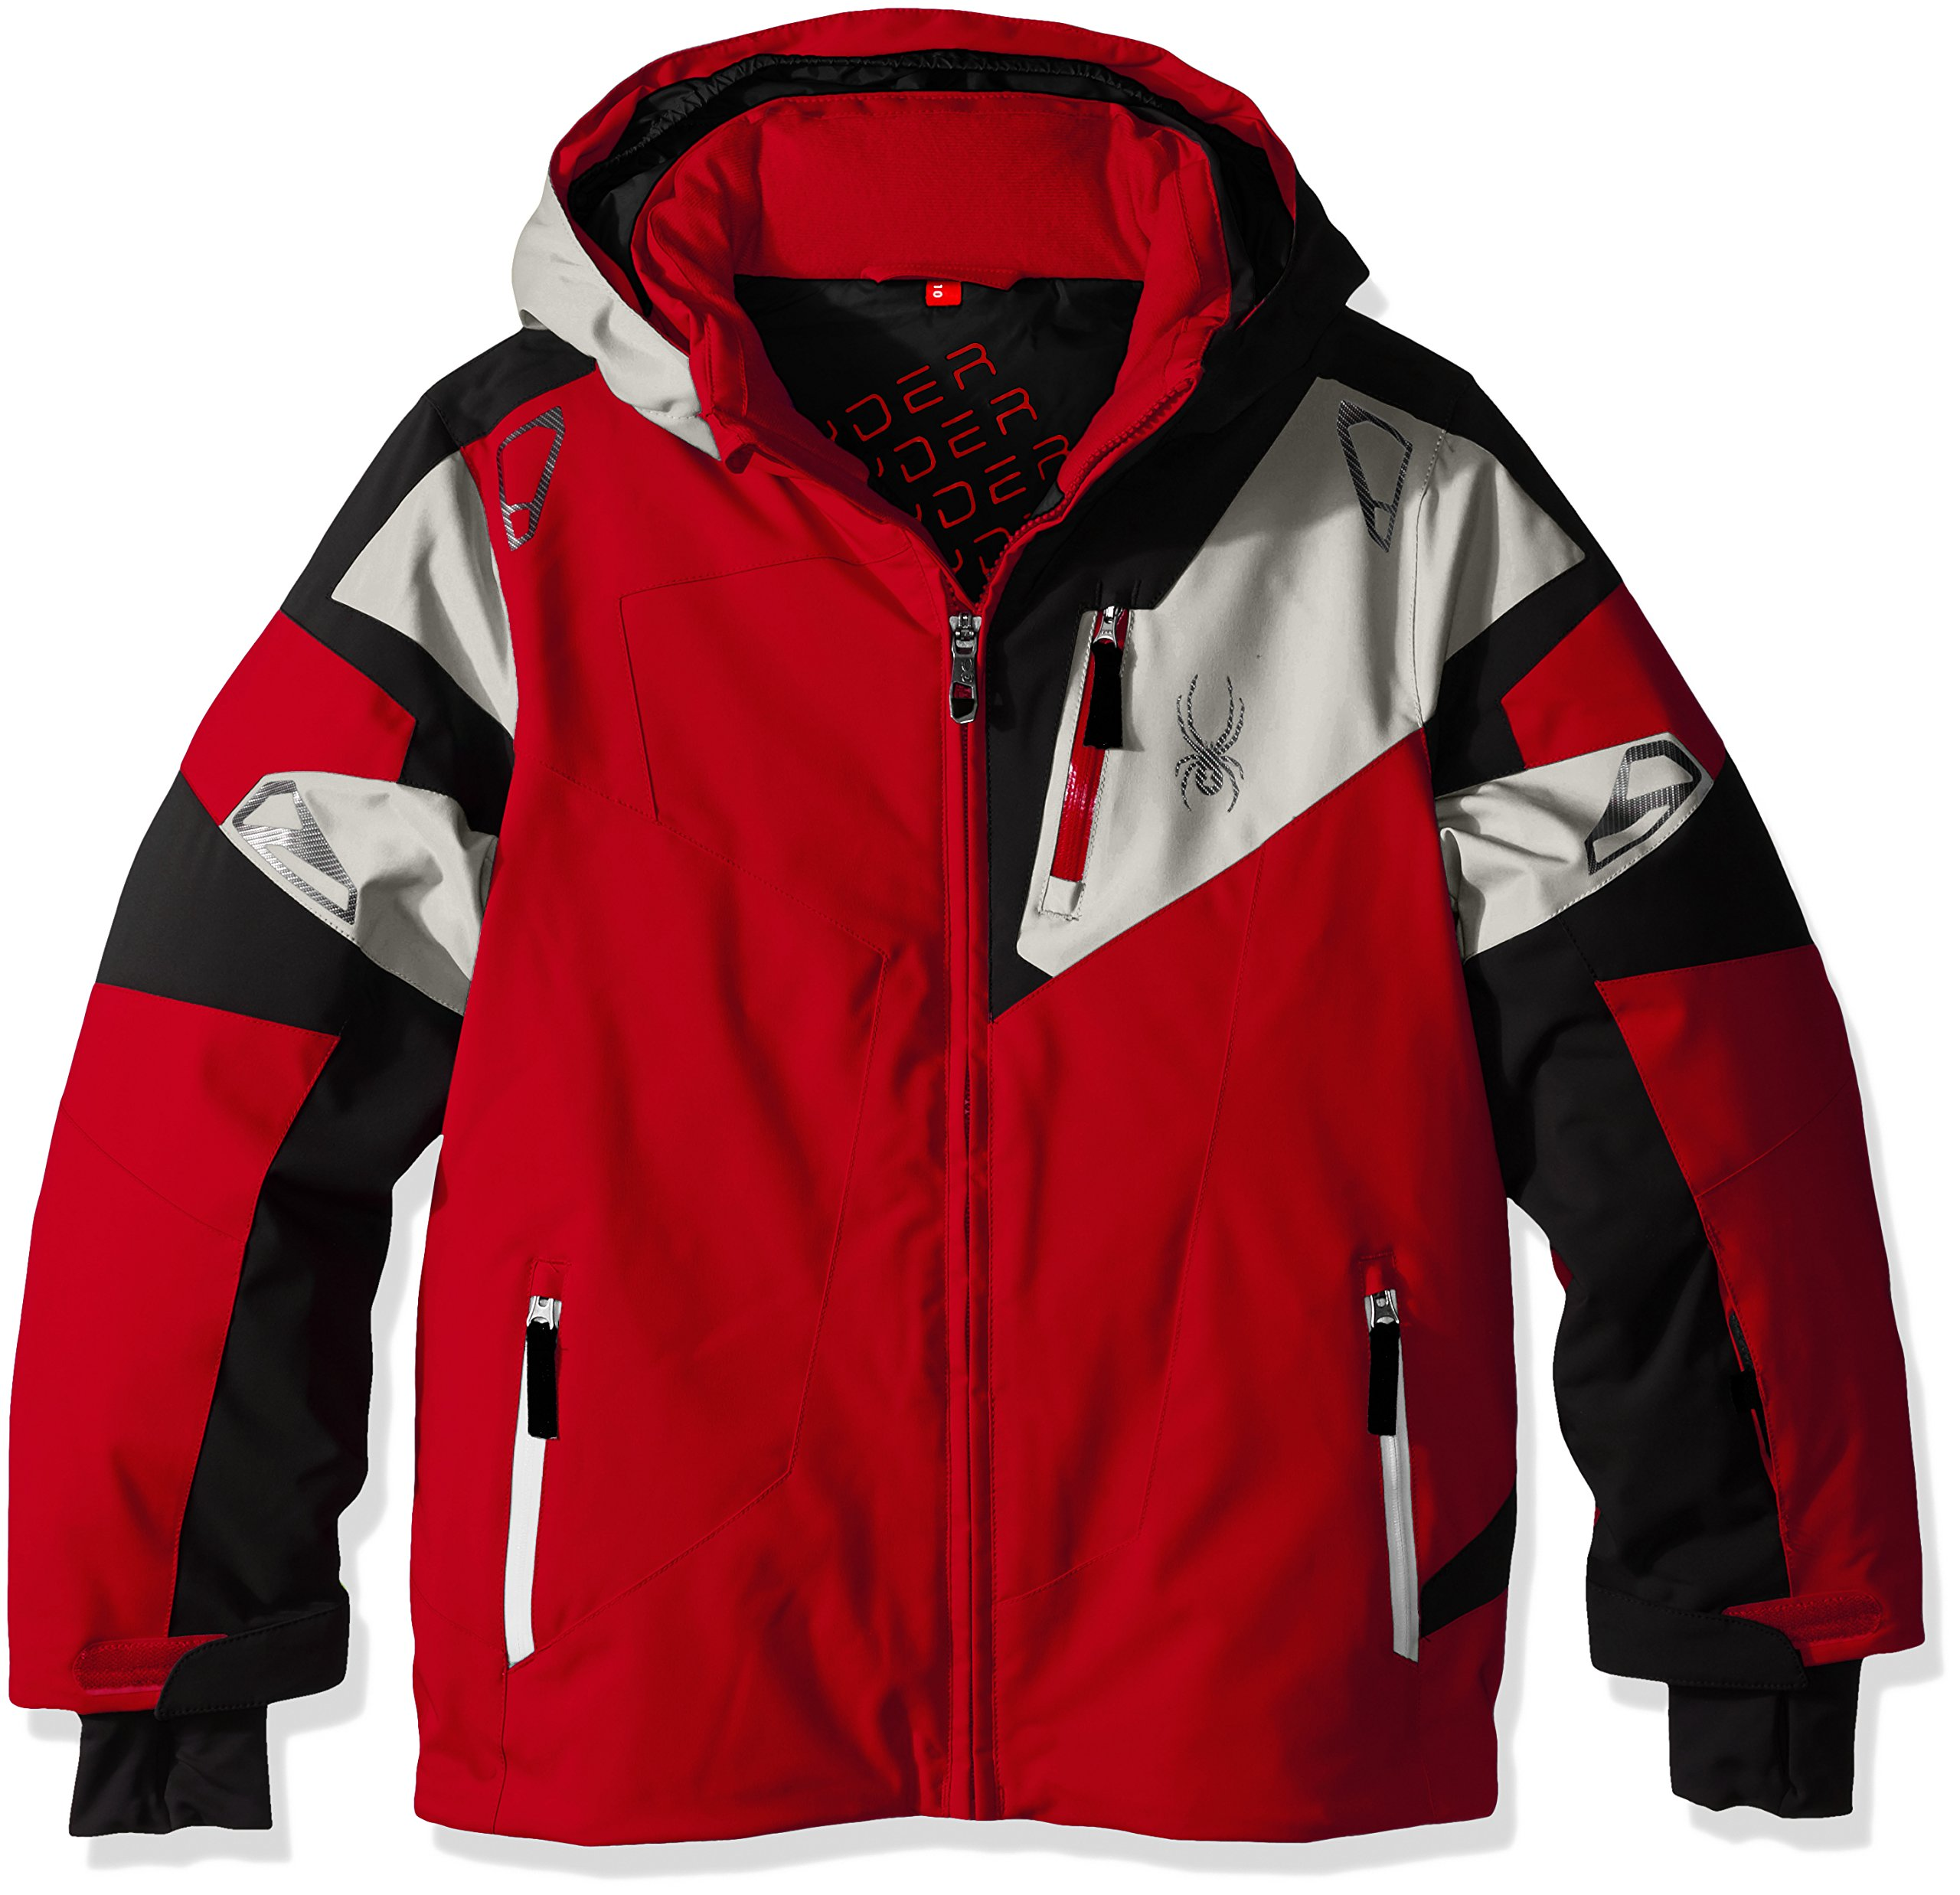 Spyder Boys Leader Jacket, Size 16, Formula/Black/Cirrus